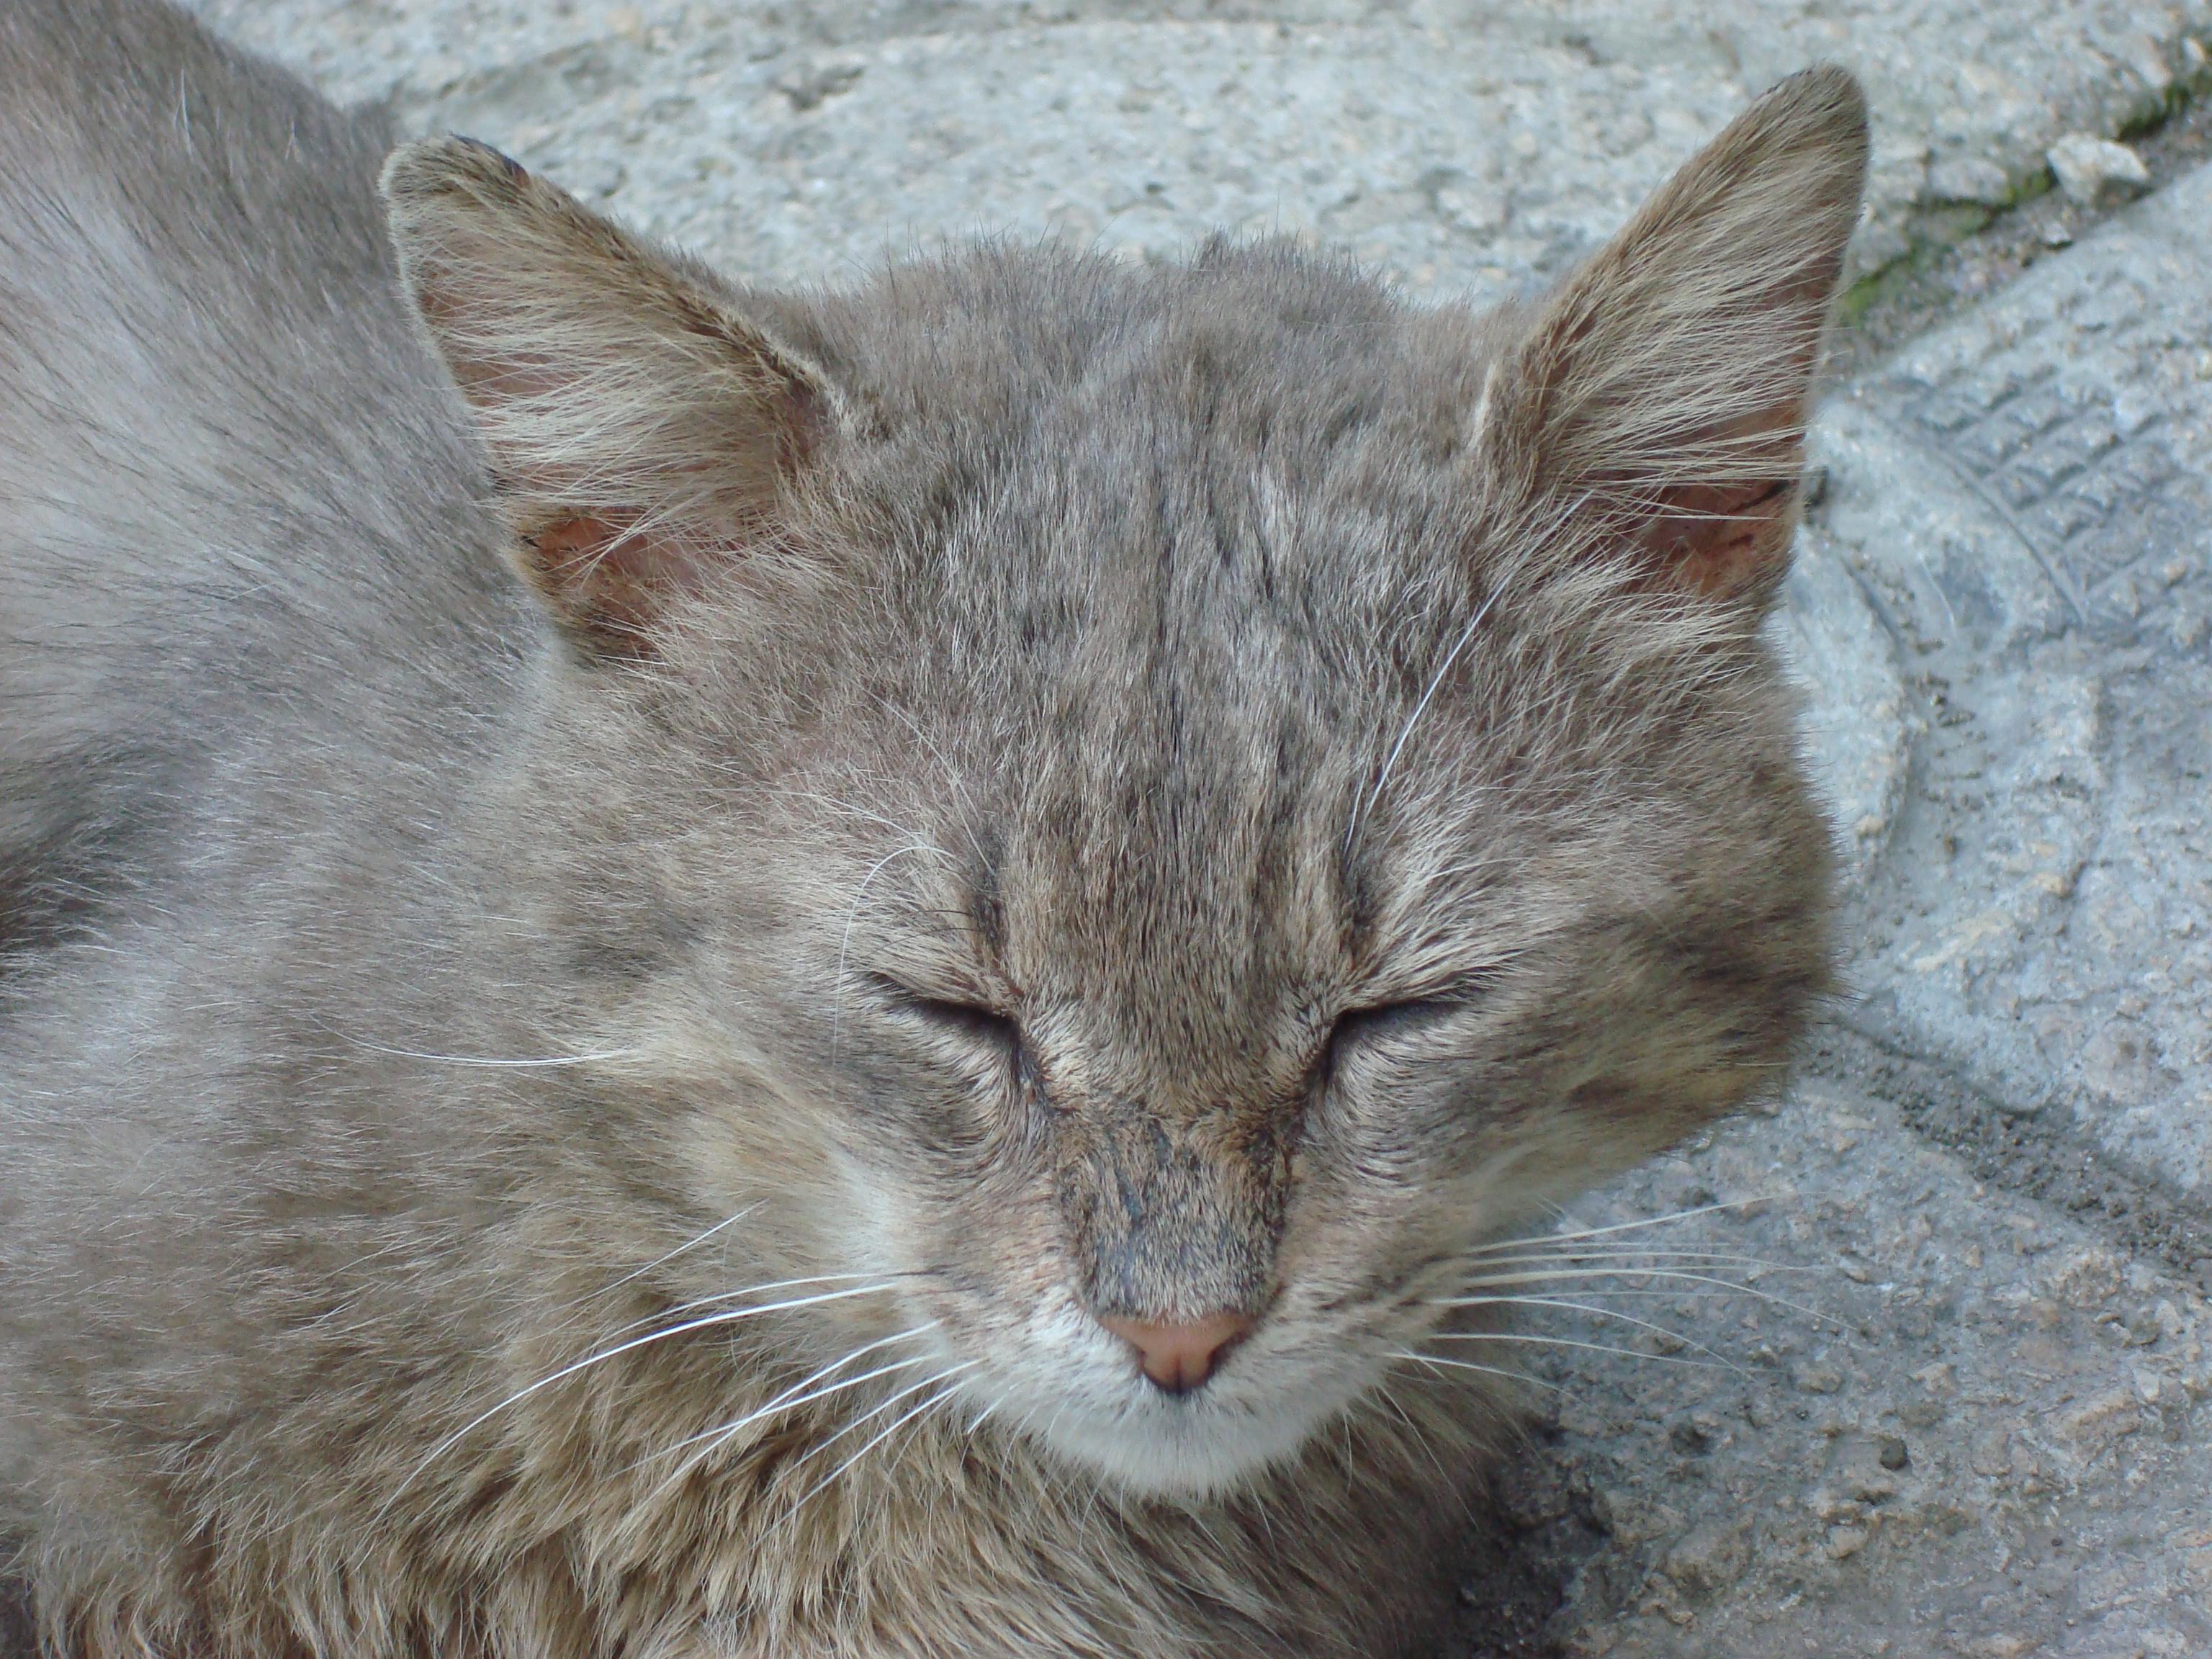 Urban cat sleeping, Aminal, Cat, Ears, Feline, HQ Photo